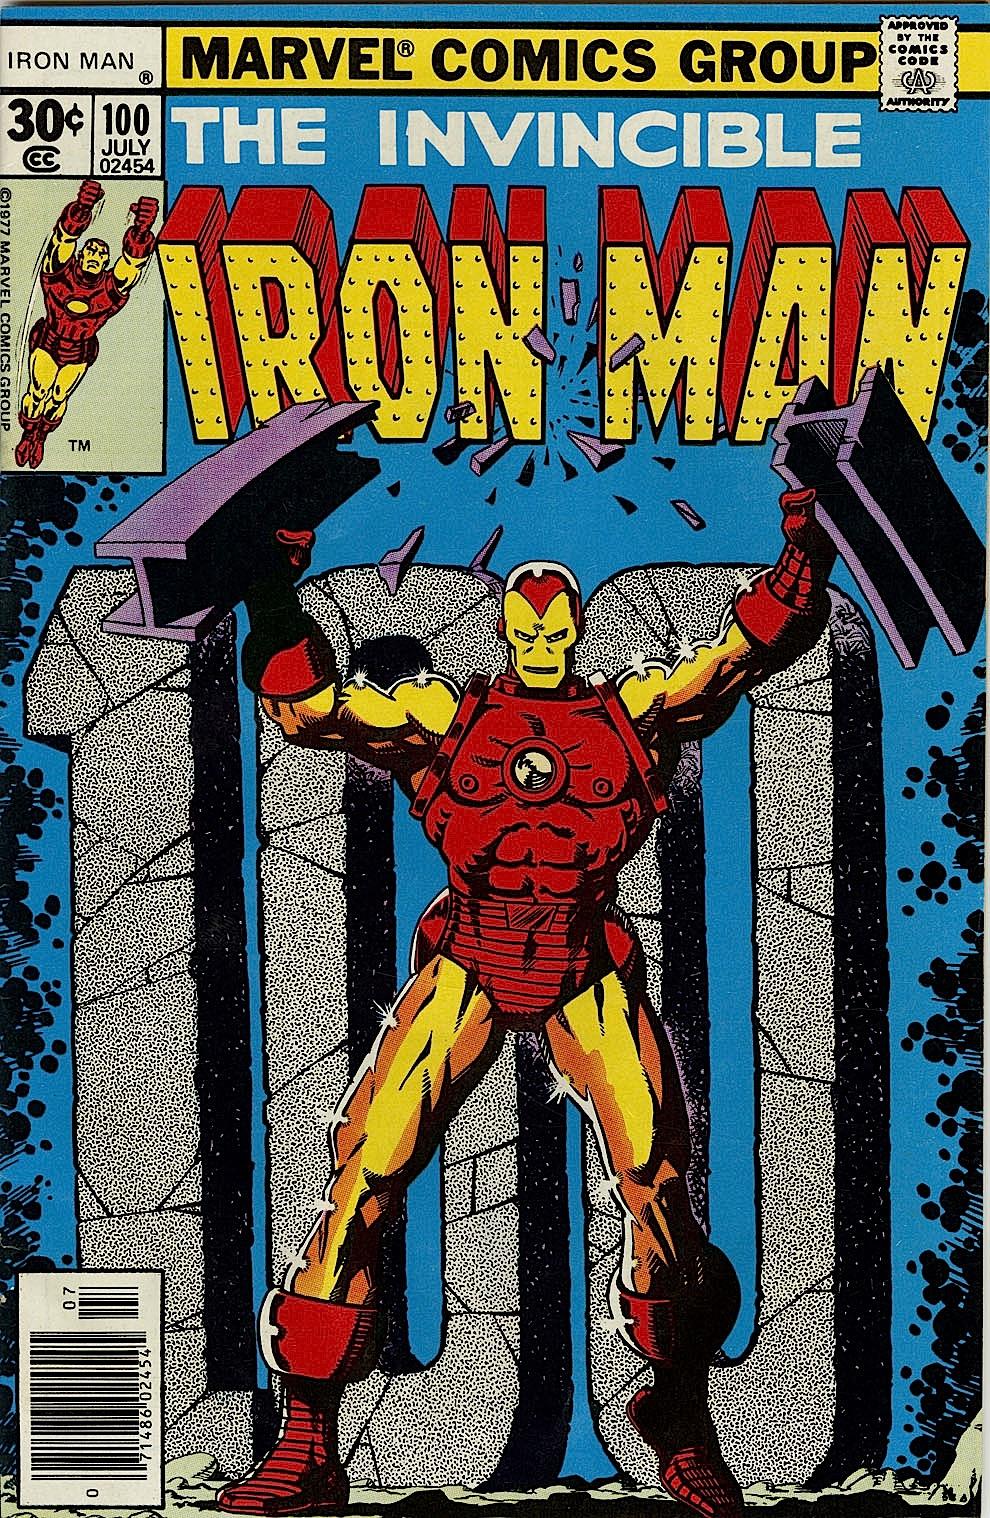 Iron_Man_100